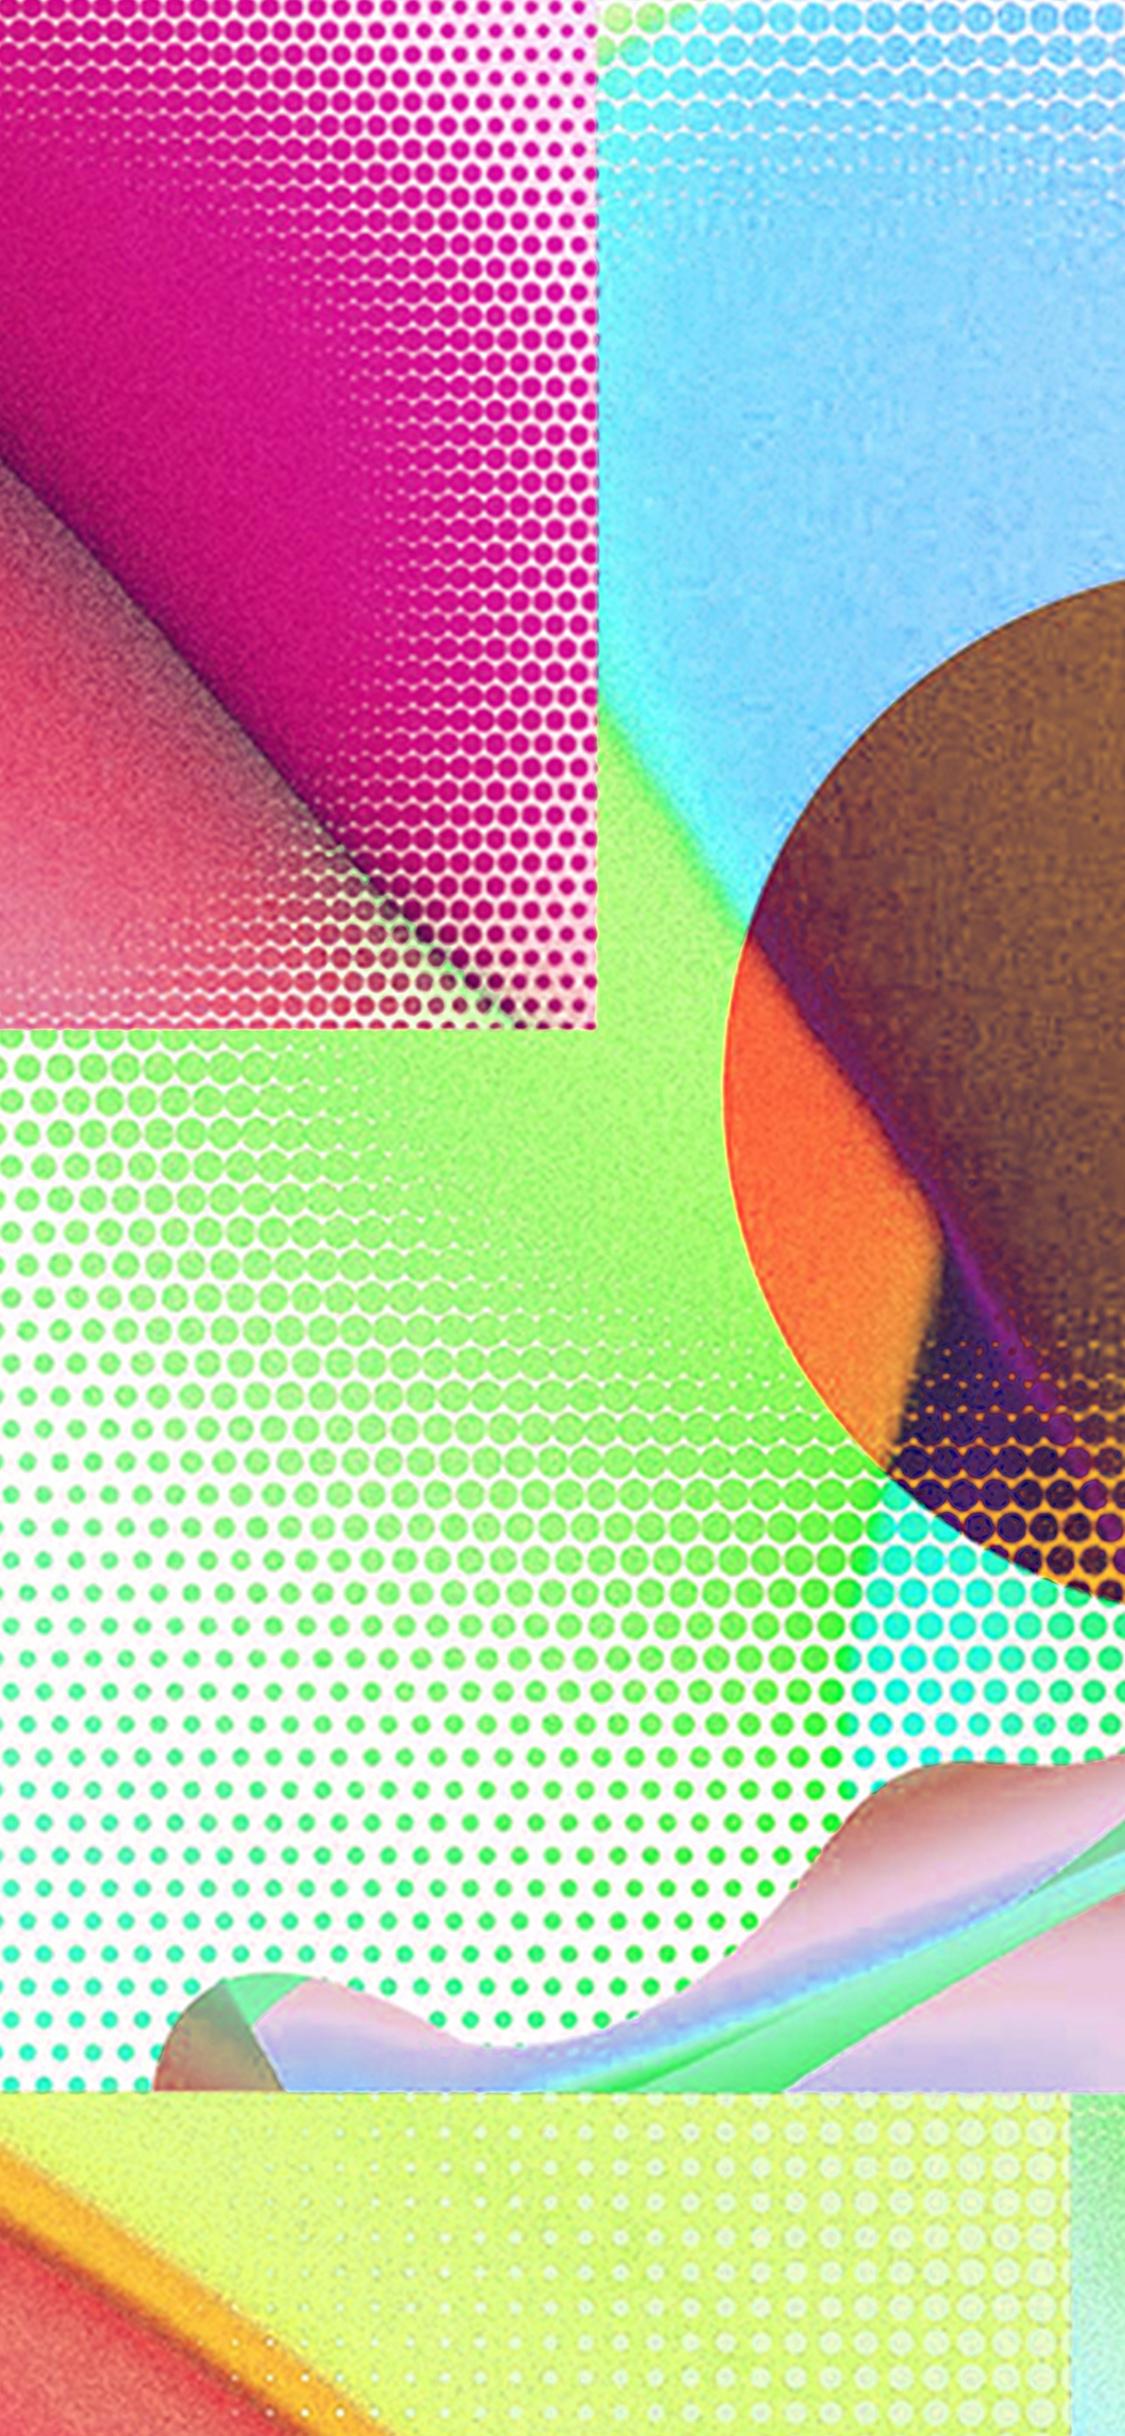 iPhonexpapers.com-Apple-iPhone-wallpaper-ba98-abstract-pattern-circle-illustration-art-dot